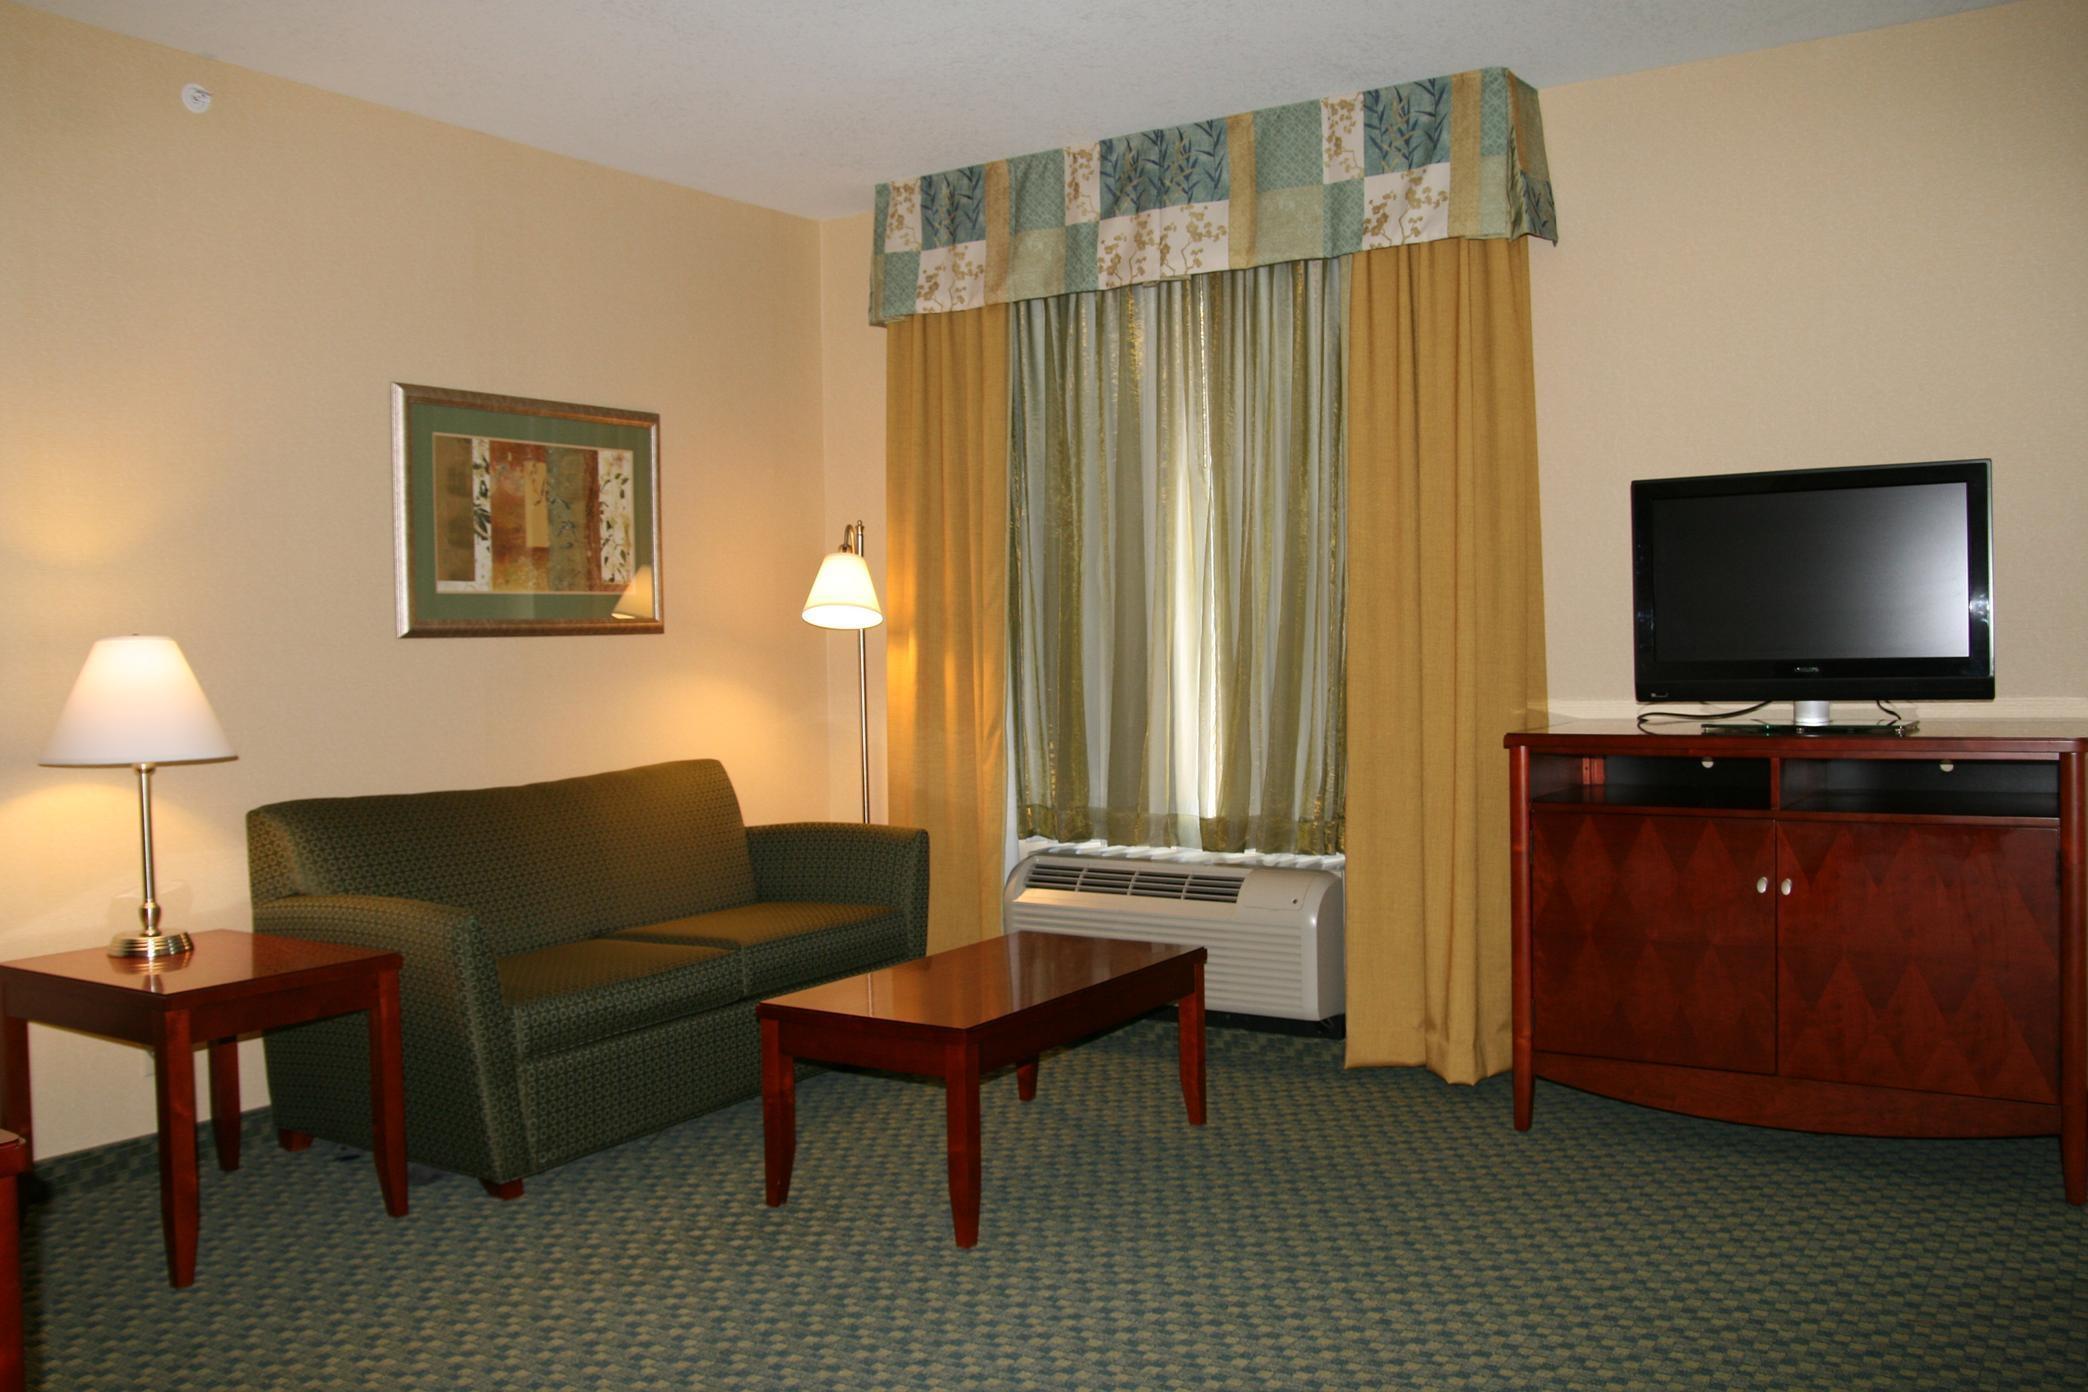 Hampton Inn & Suites El Paso West image 18